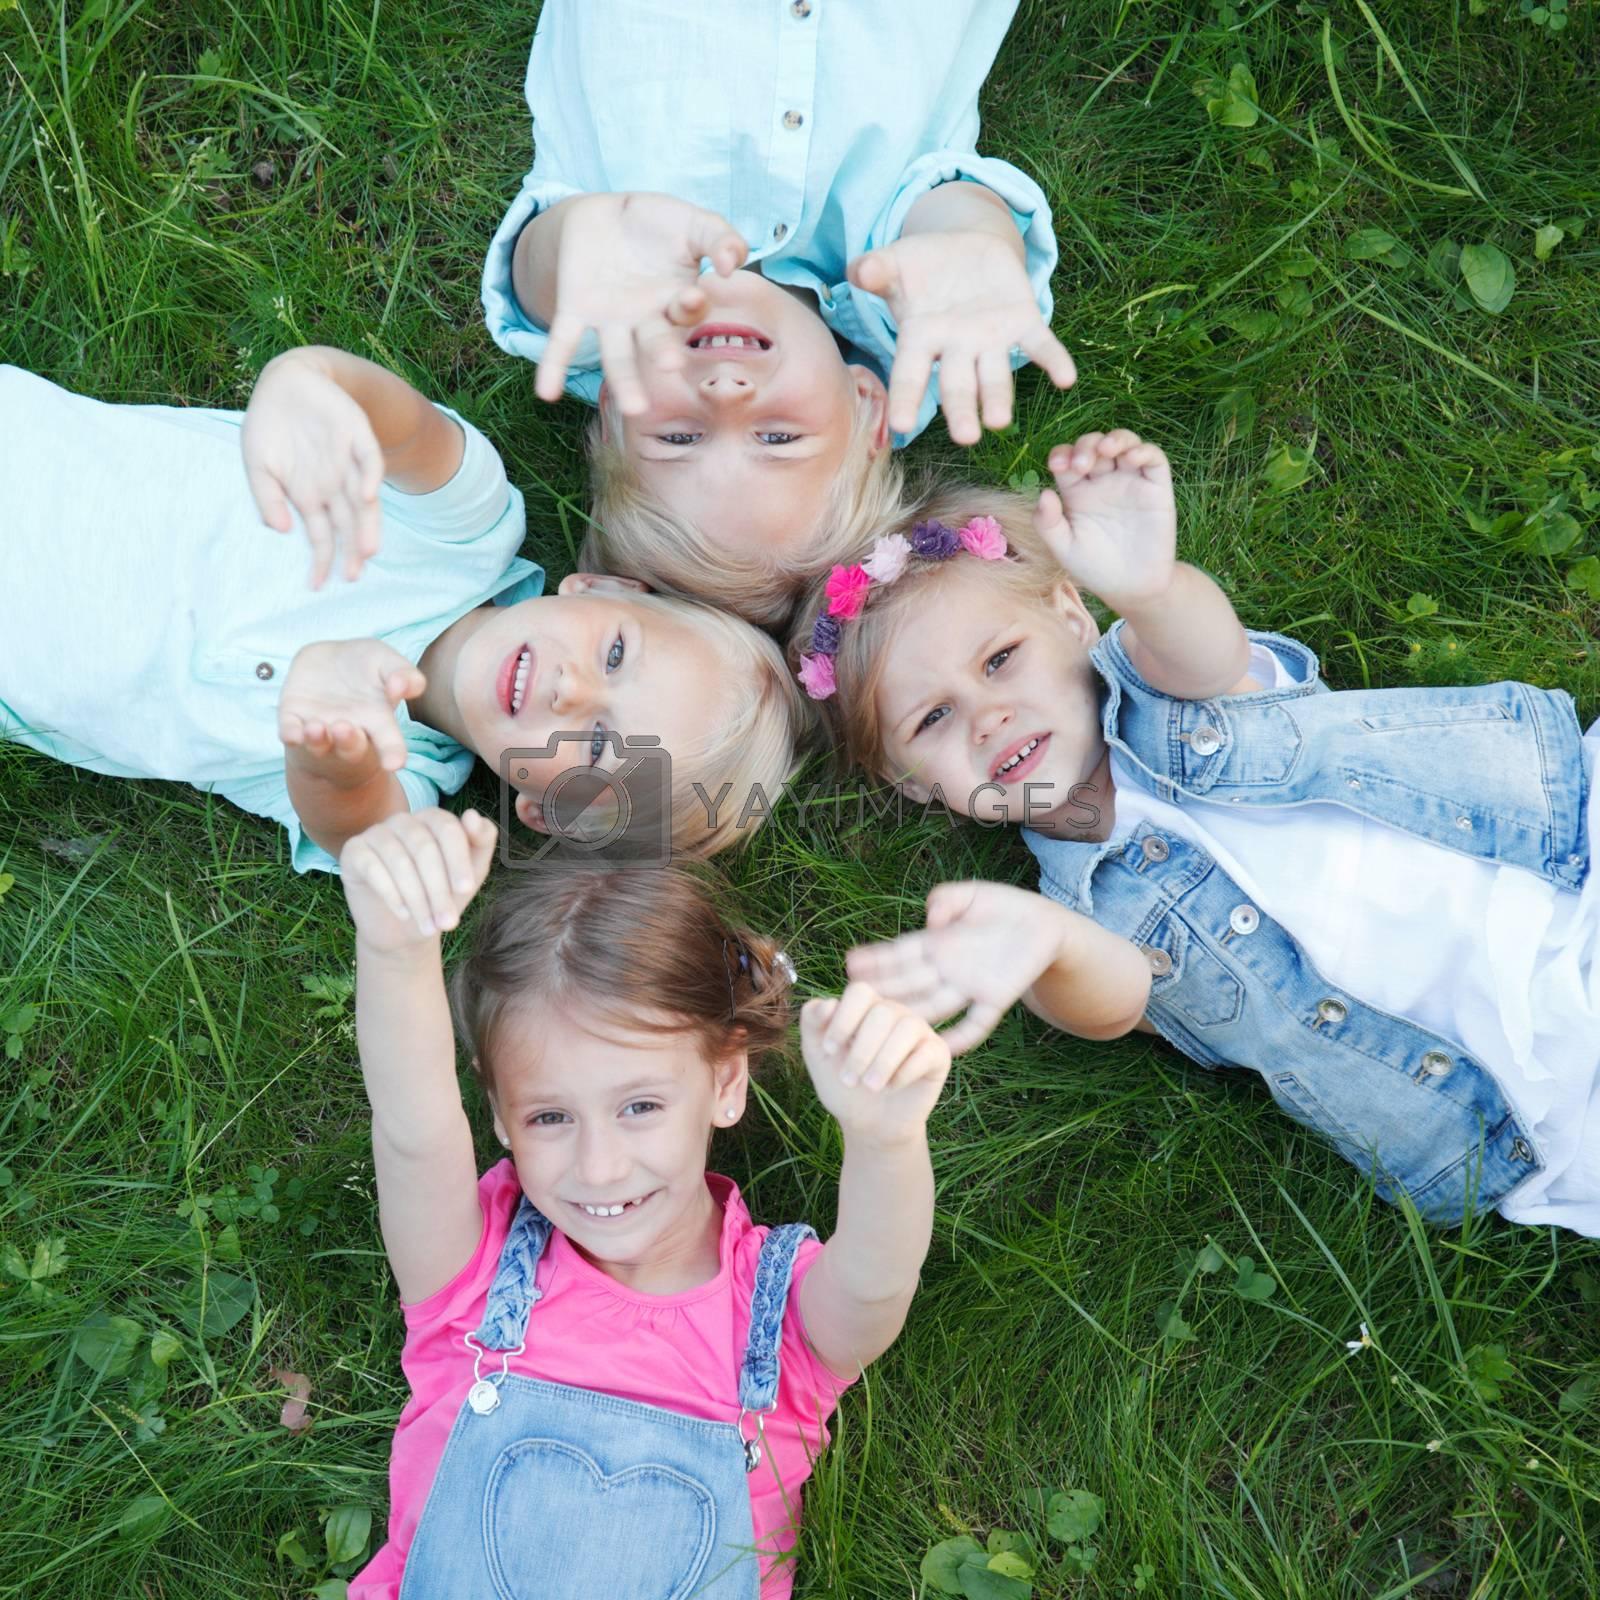 Little children friends laying on grass in summer park top view